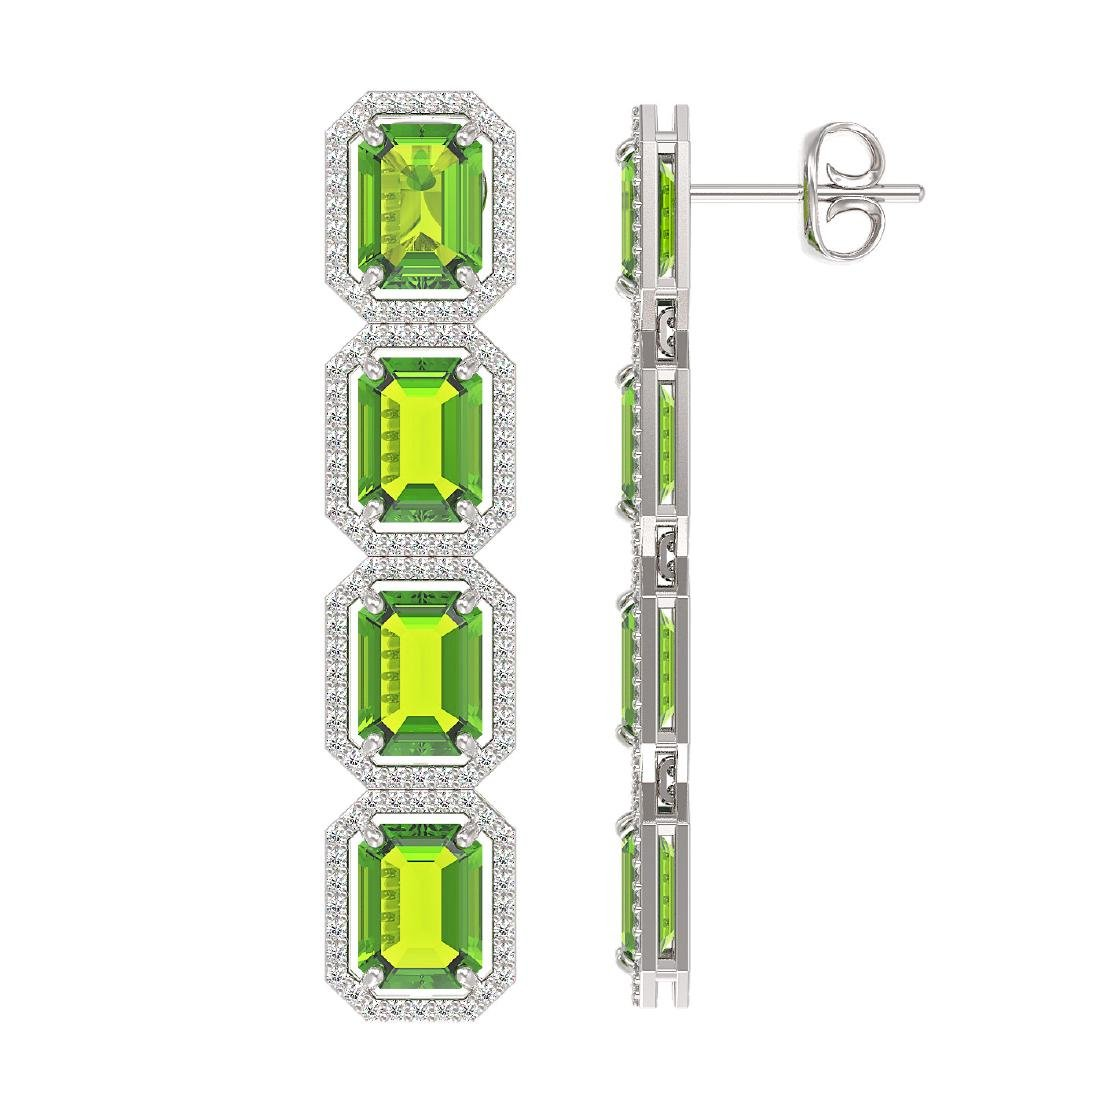 17.81 CTW Peridot & Diamond Halo Earrings 10K White - 2